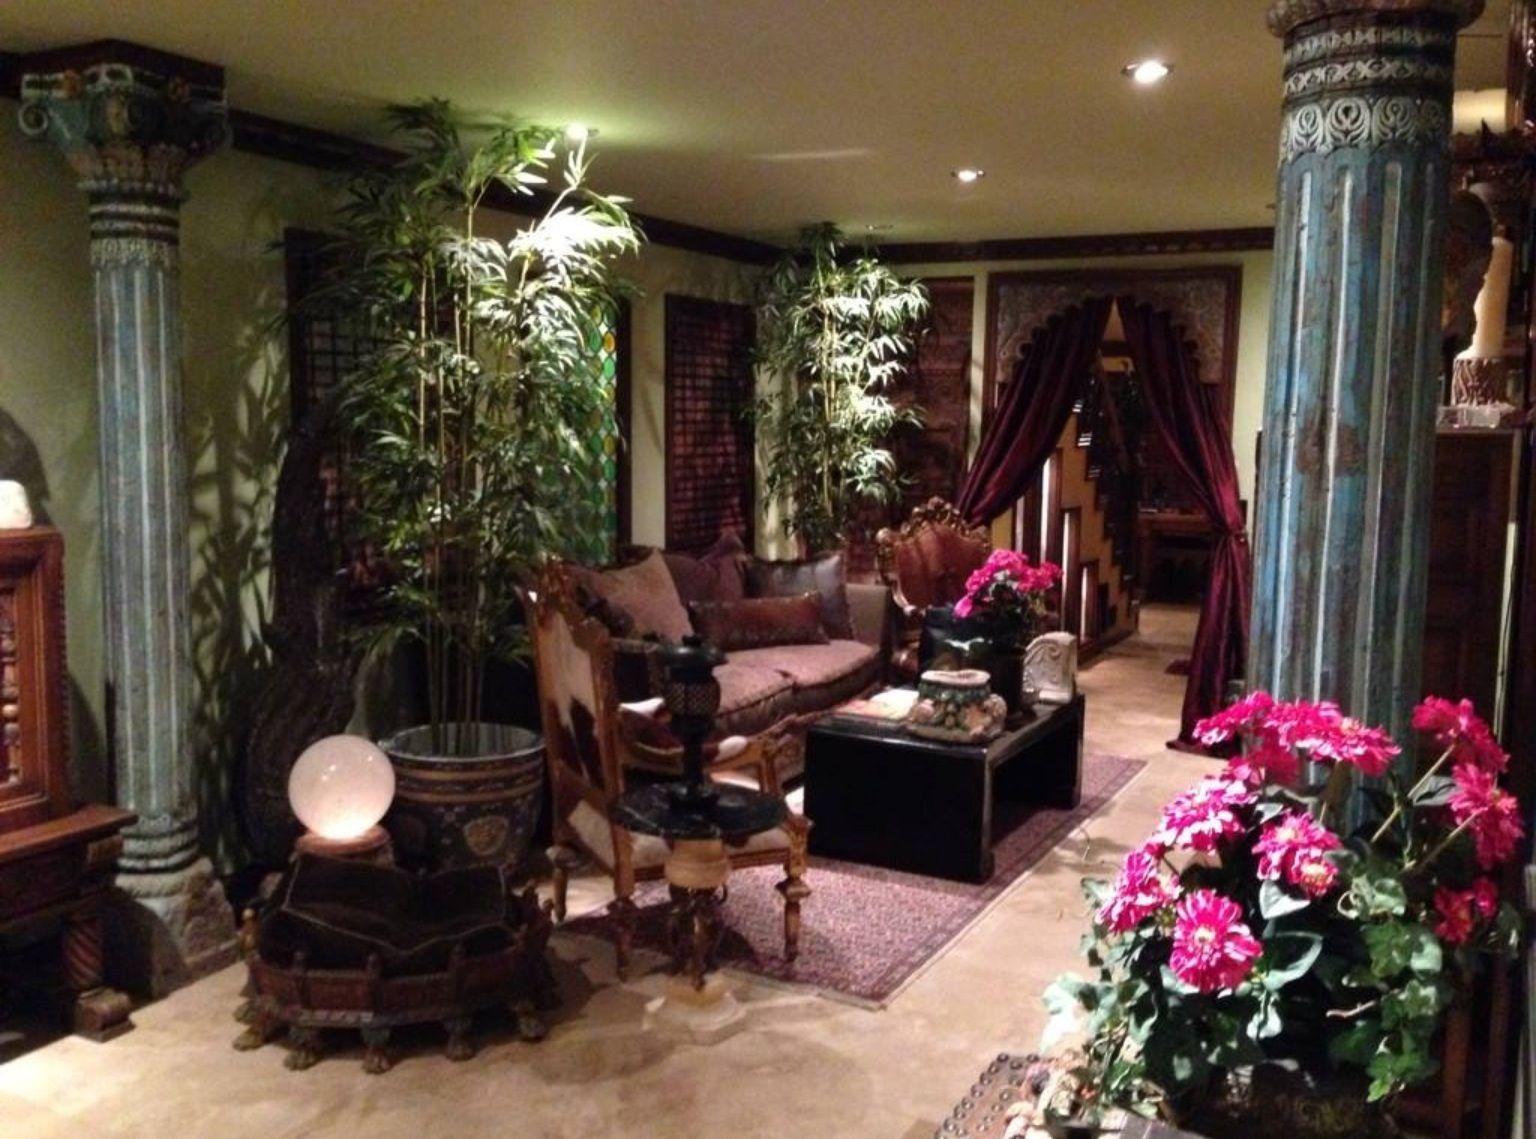 Portland remodel living room 18th c Indian columns travertine